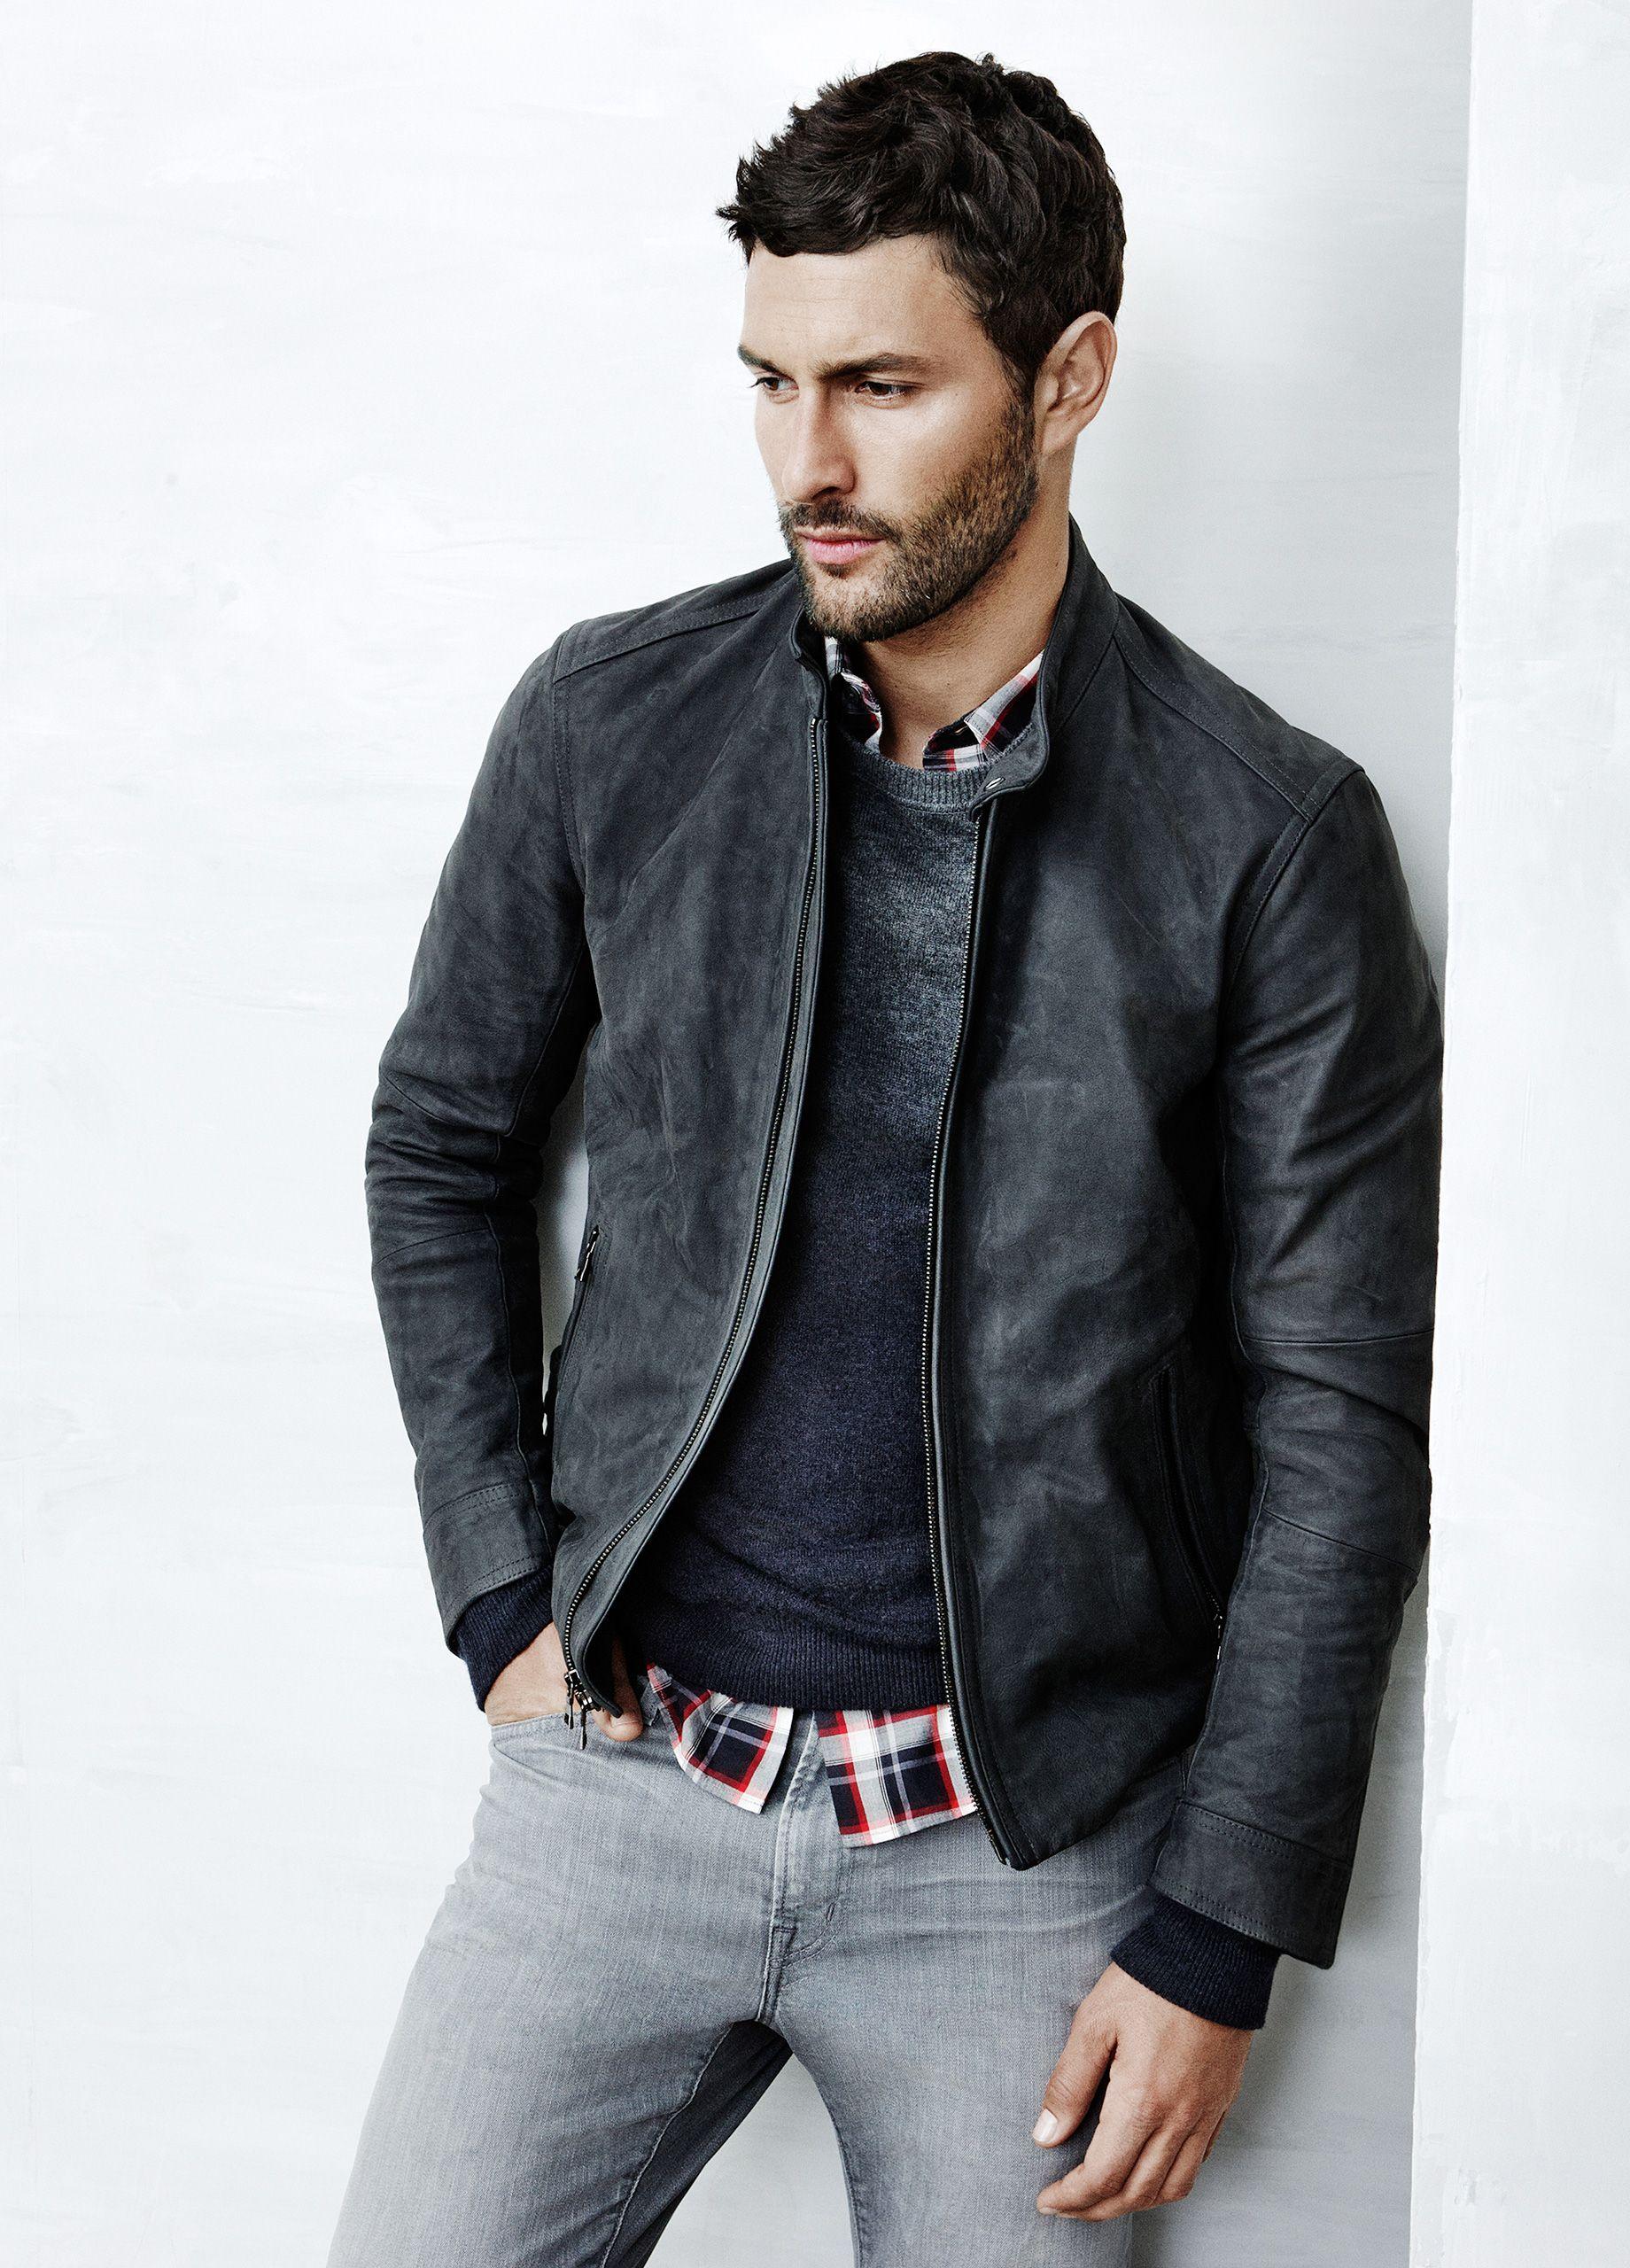 Wool cashmere flannel jacket  Vince Look  Waxed Nubuck Moto Jacket Wool Cashmere Raglan Crew Neck